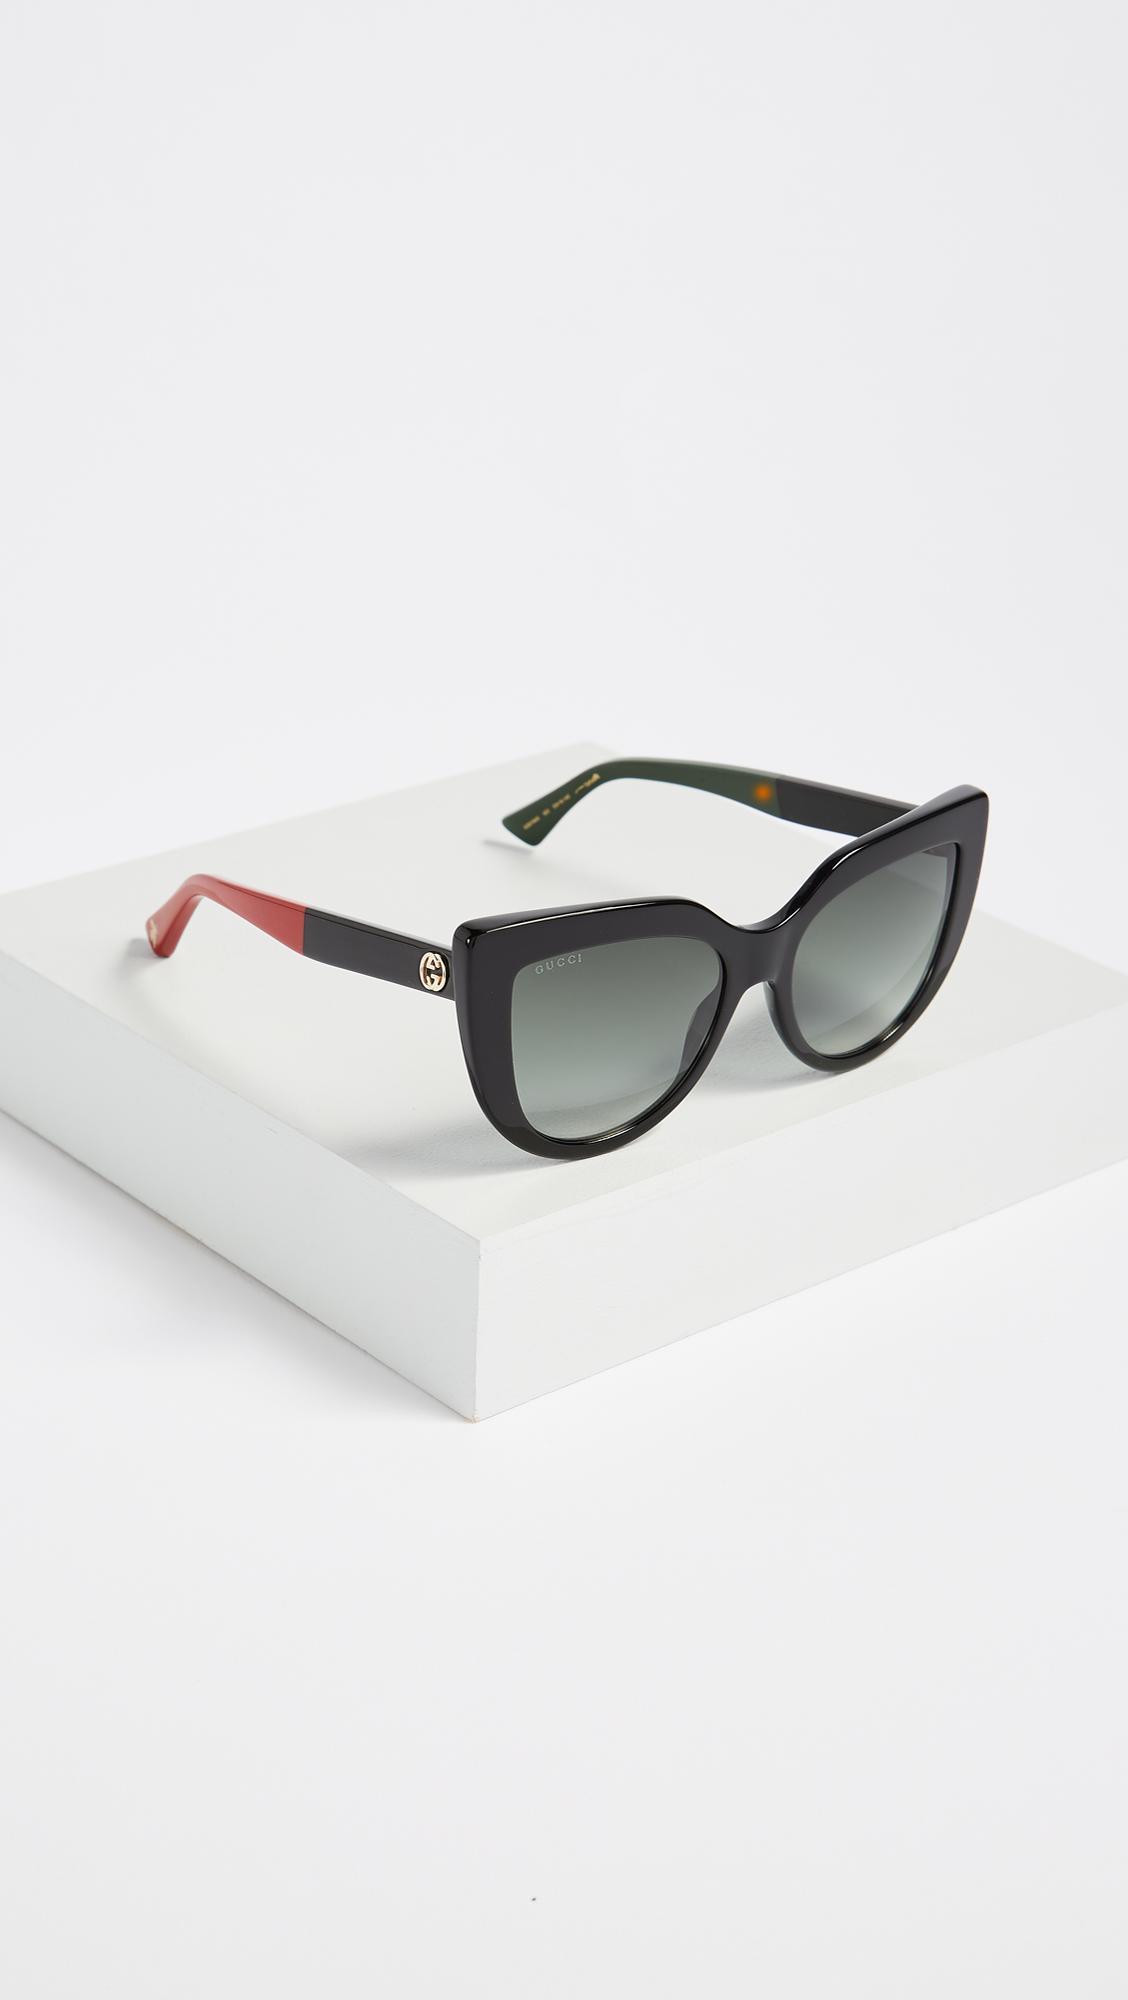 480c43829b91 Gucci Cat Eye Flat Top Sunglasses in Gray - Lyst